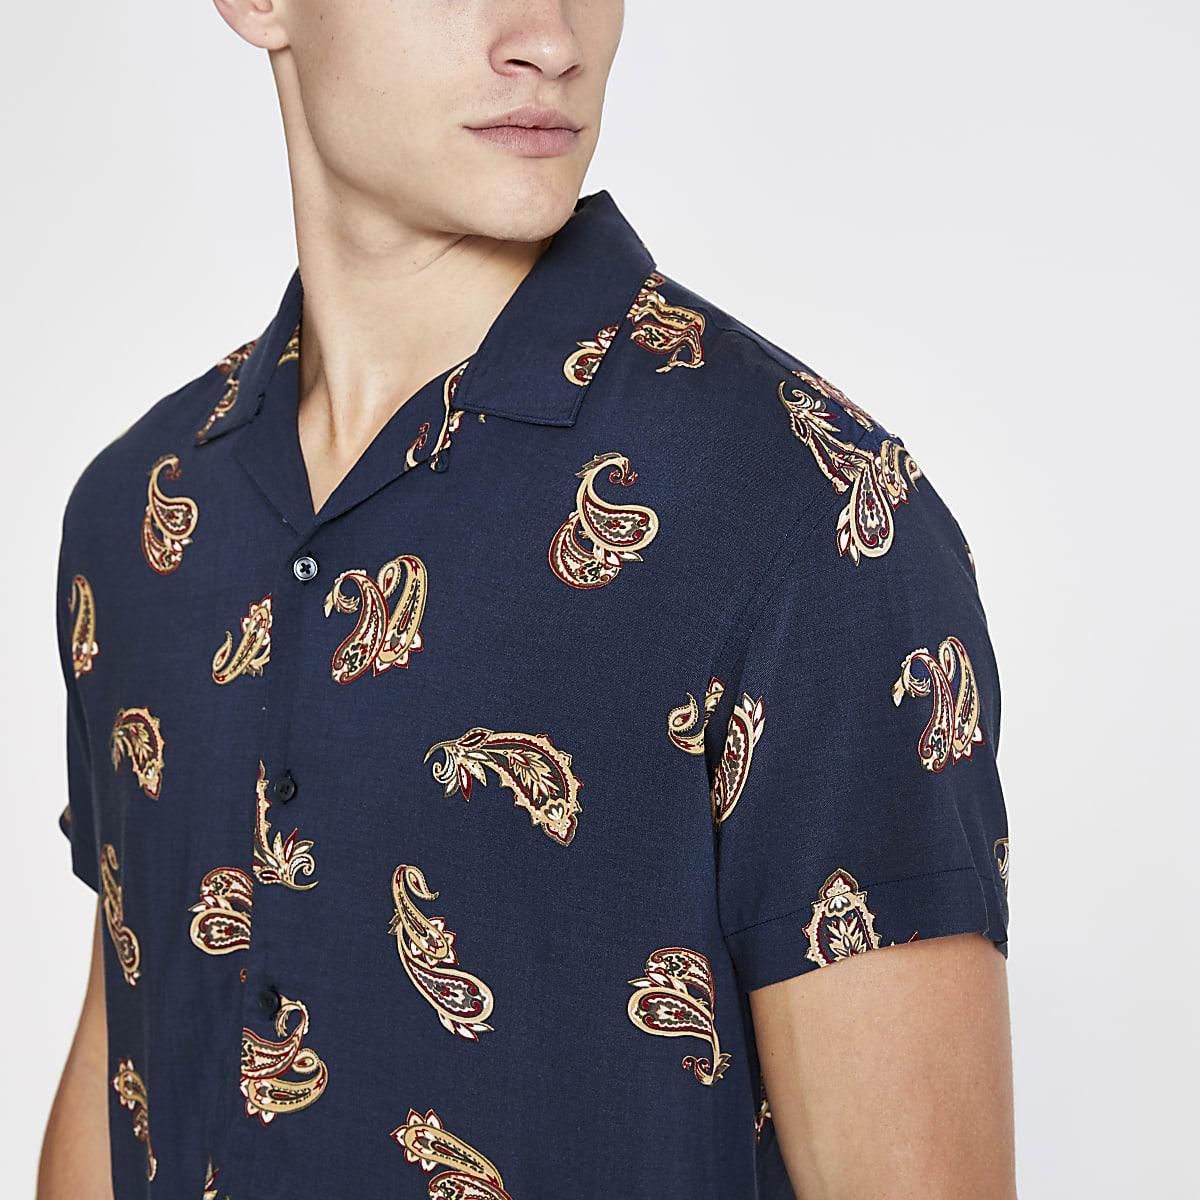 Jack and Jones navy print short sleeve shirt